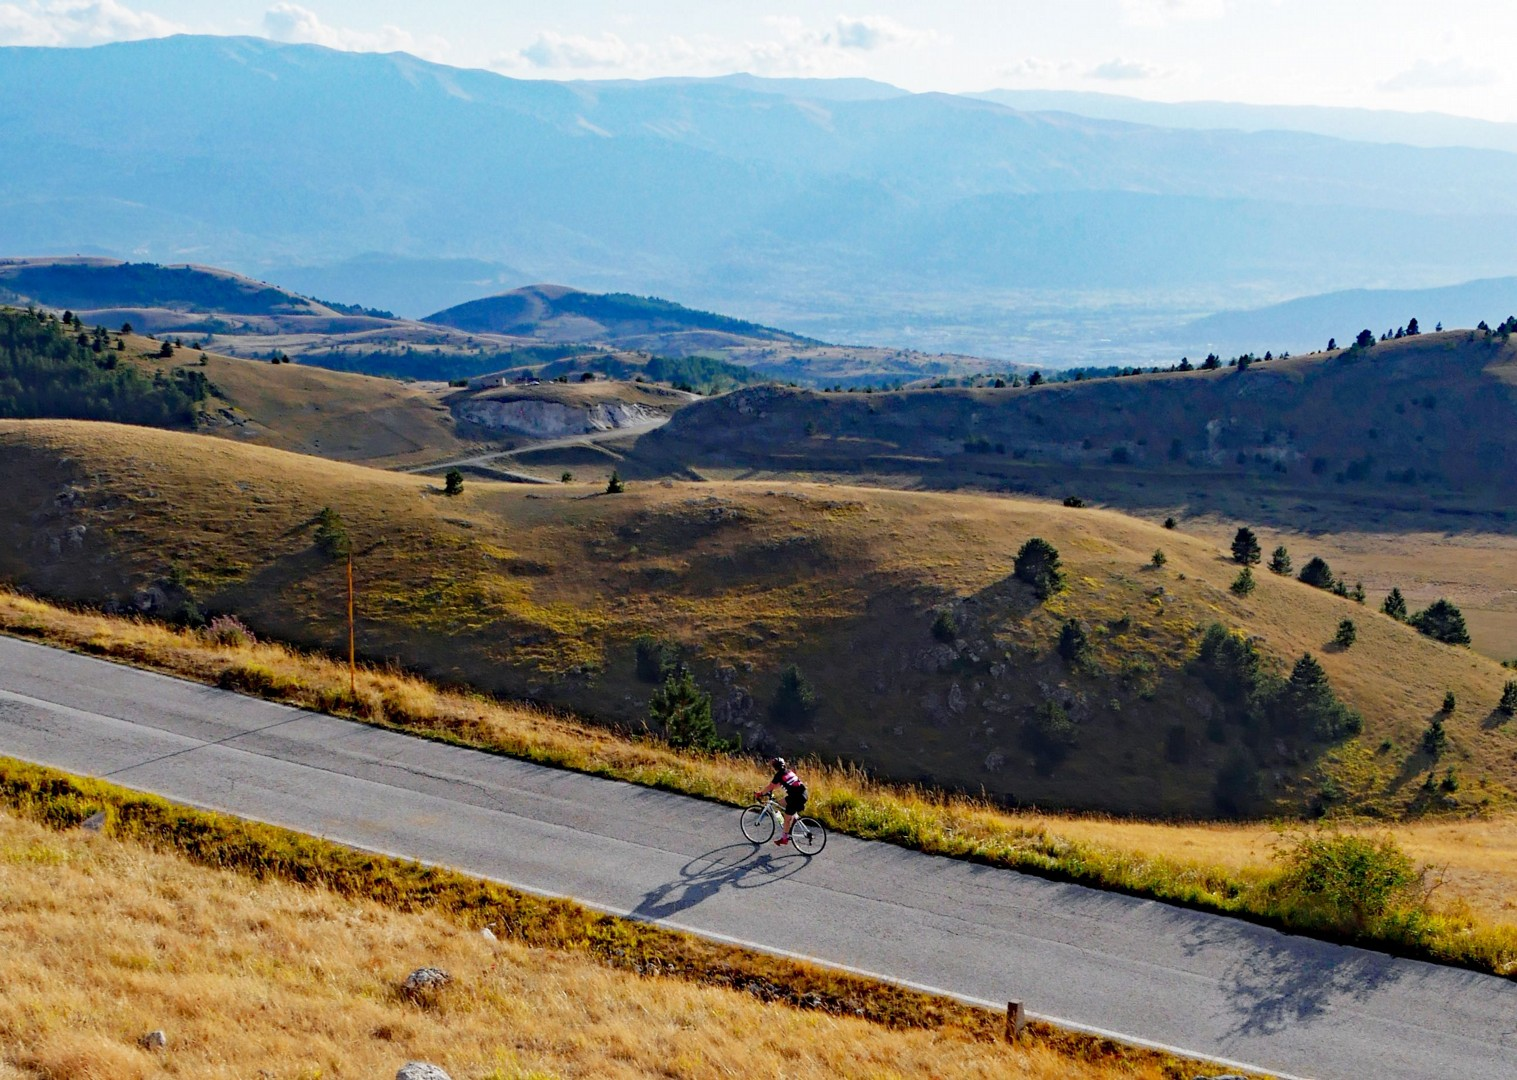 gran-sasso-road-cycling-holiday-italy-abruzzo.jpg - Italy - Abruzzo - Appennini d'Abruzzo - Guided Road Cycling Holiday - Road Cycling